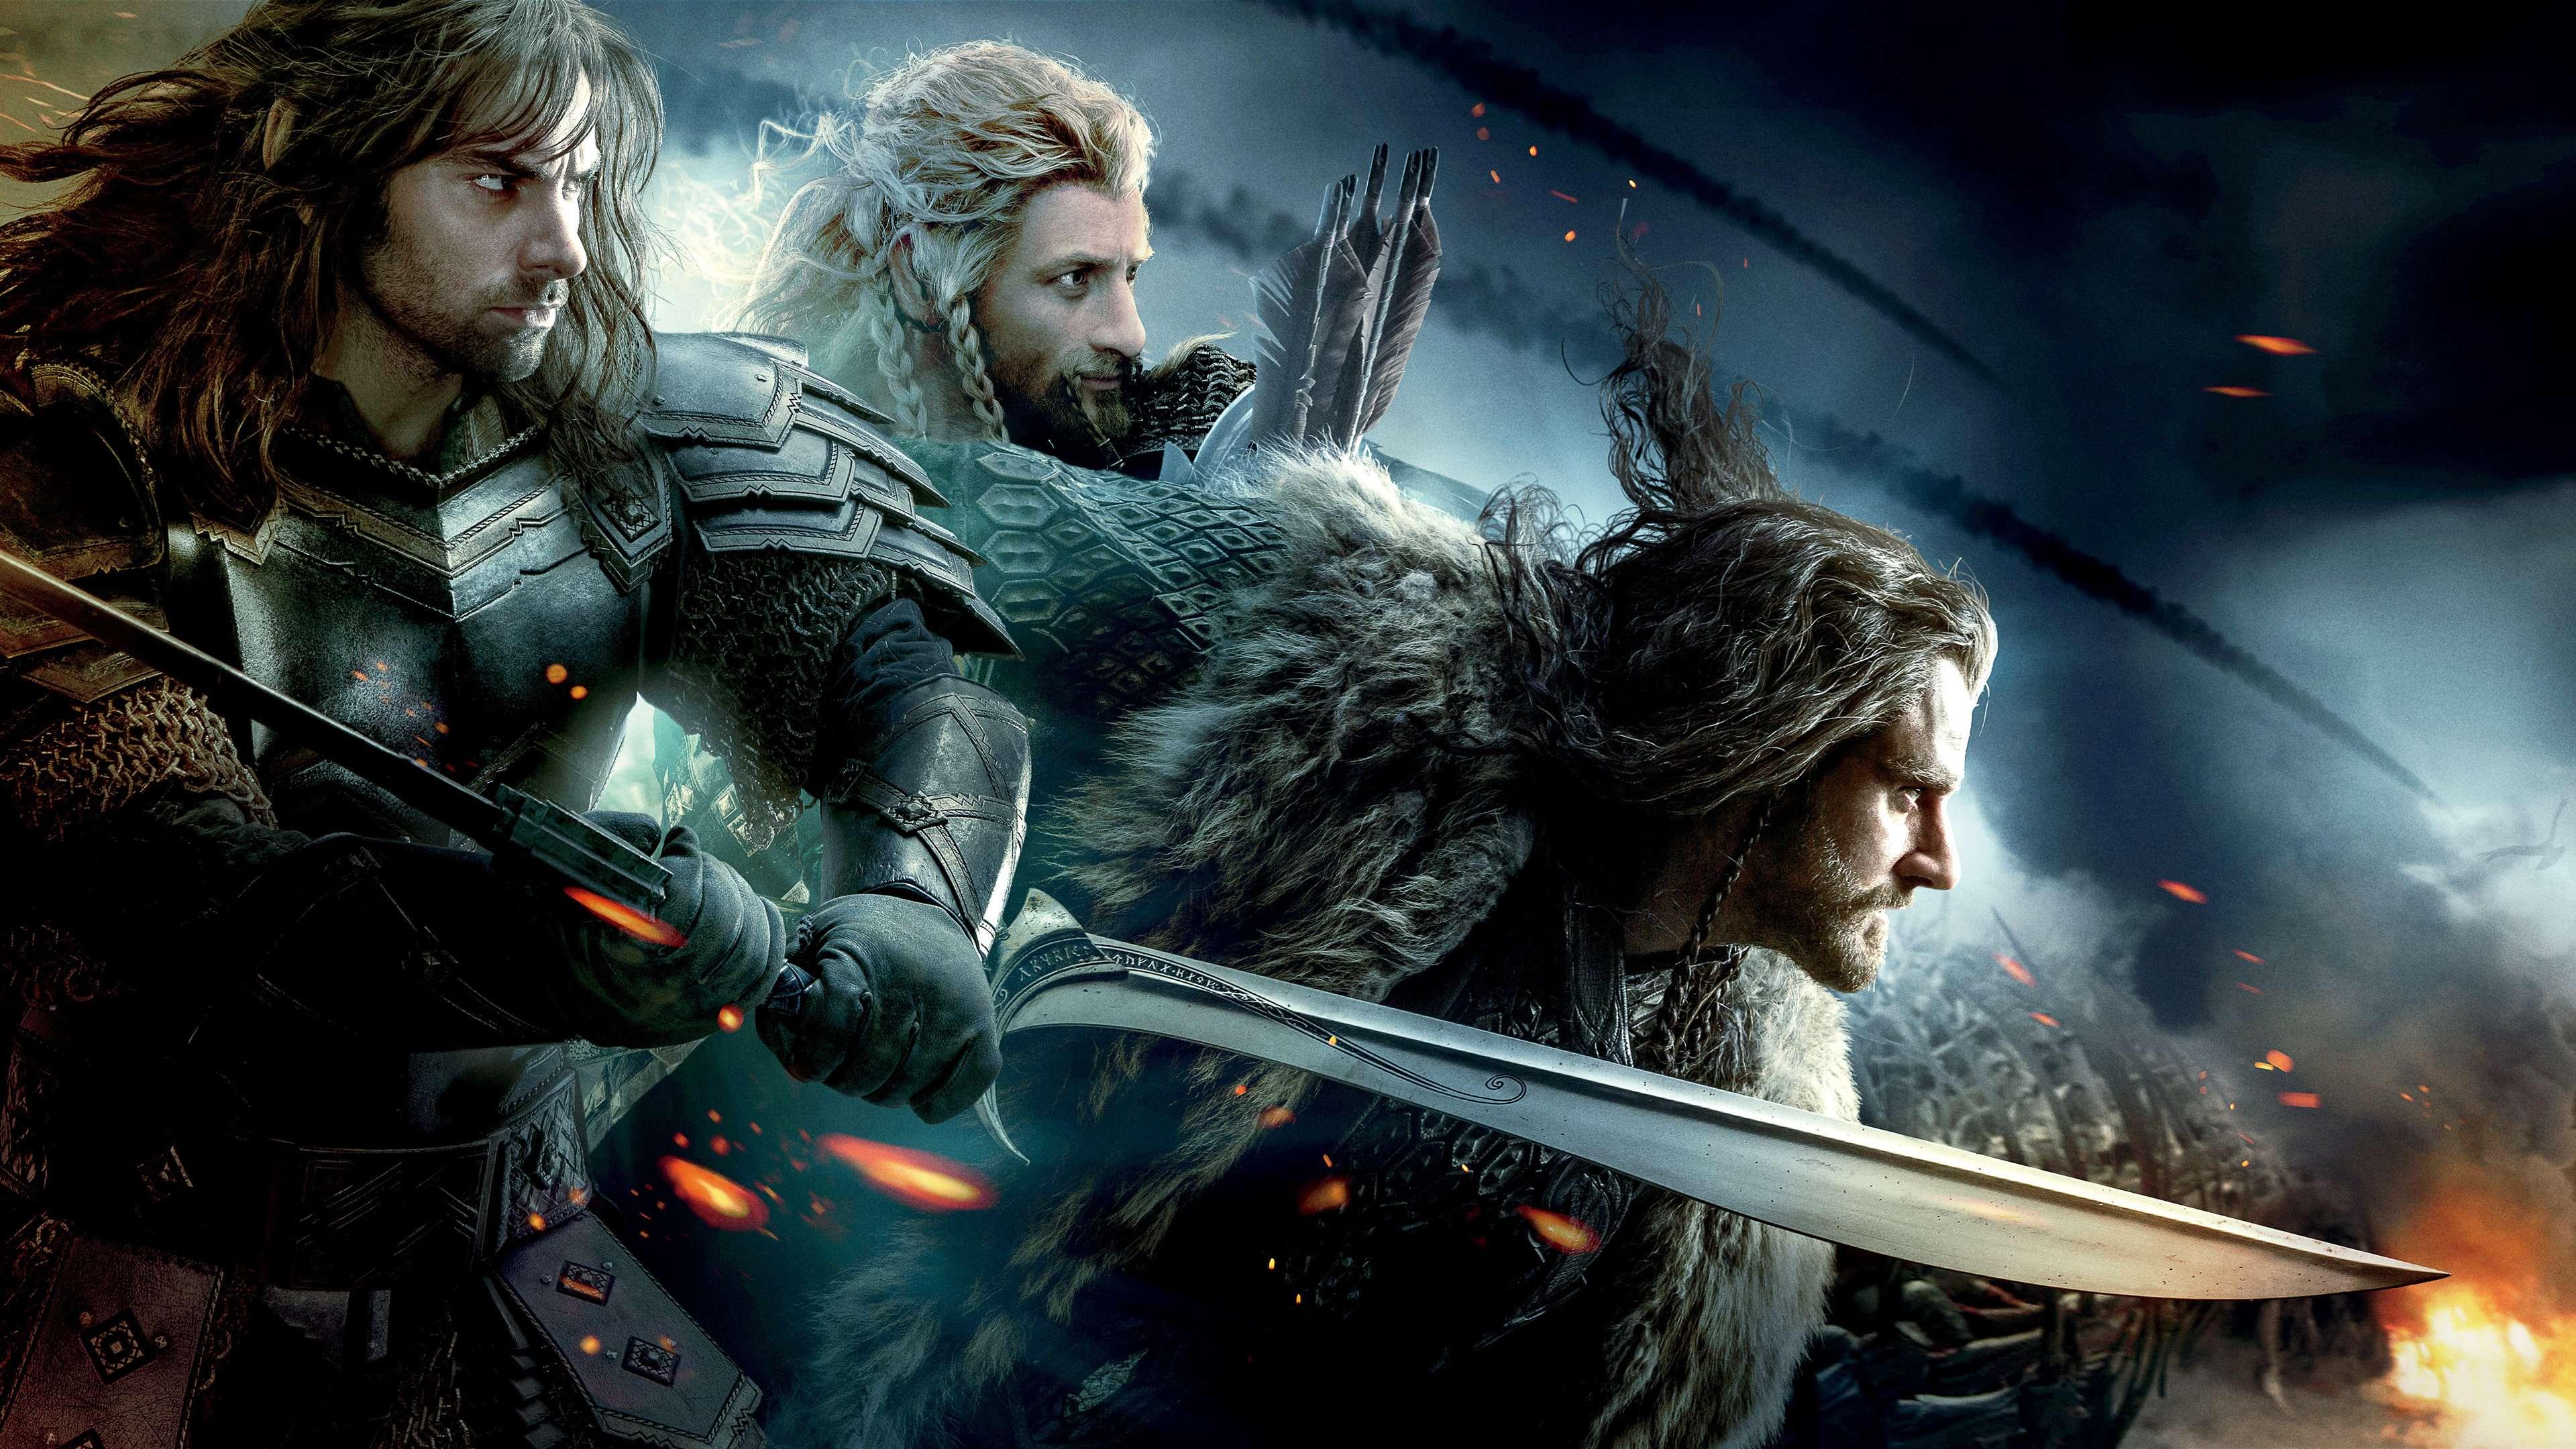 The Hobbit Battle Of Five Armies Wallpaper 8